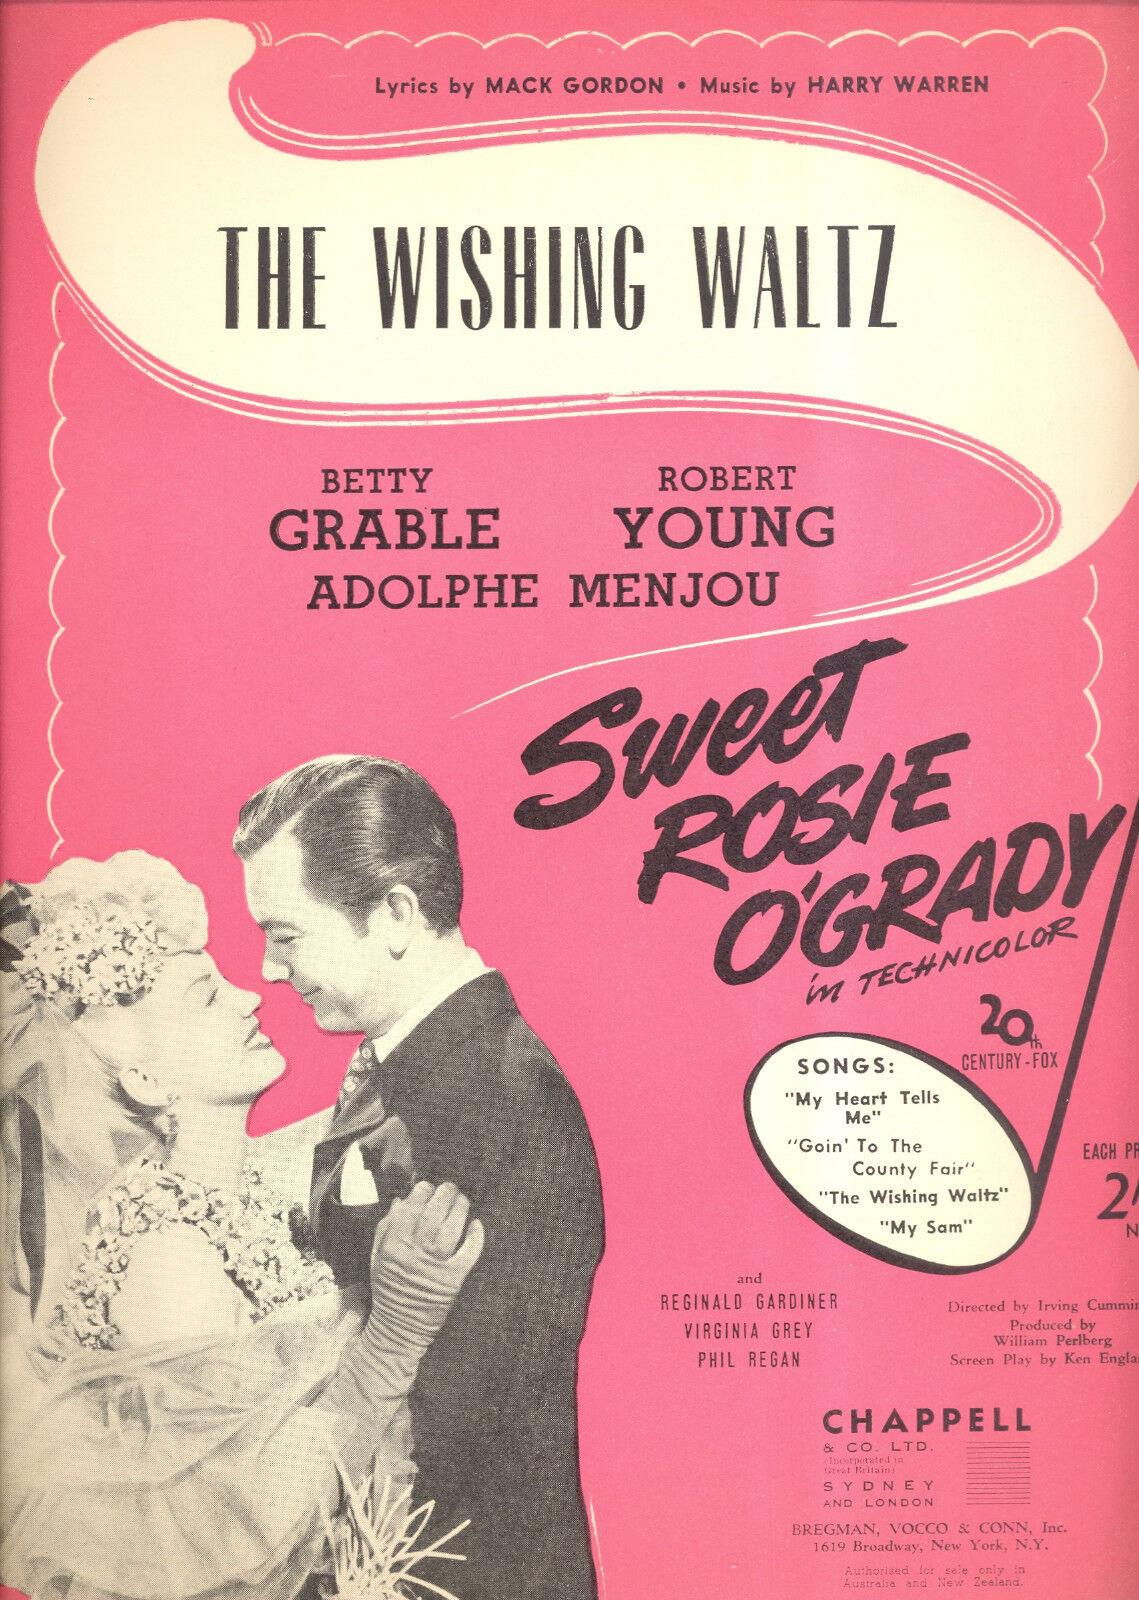 Sweet Rosie o'grady partituras    Vals  Betty Grable deseando Robert Young Austr b05c94